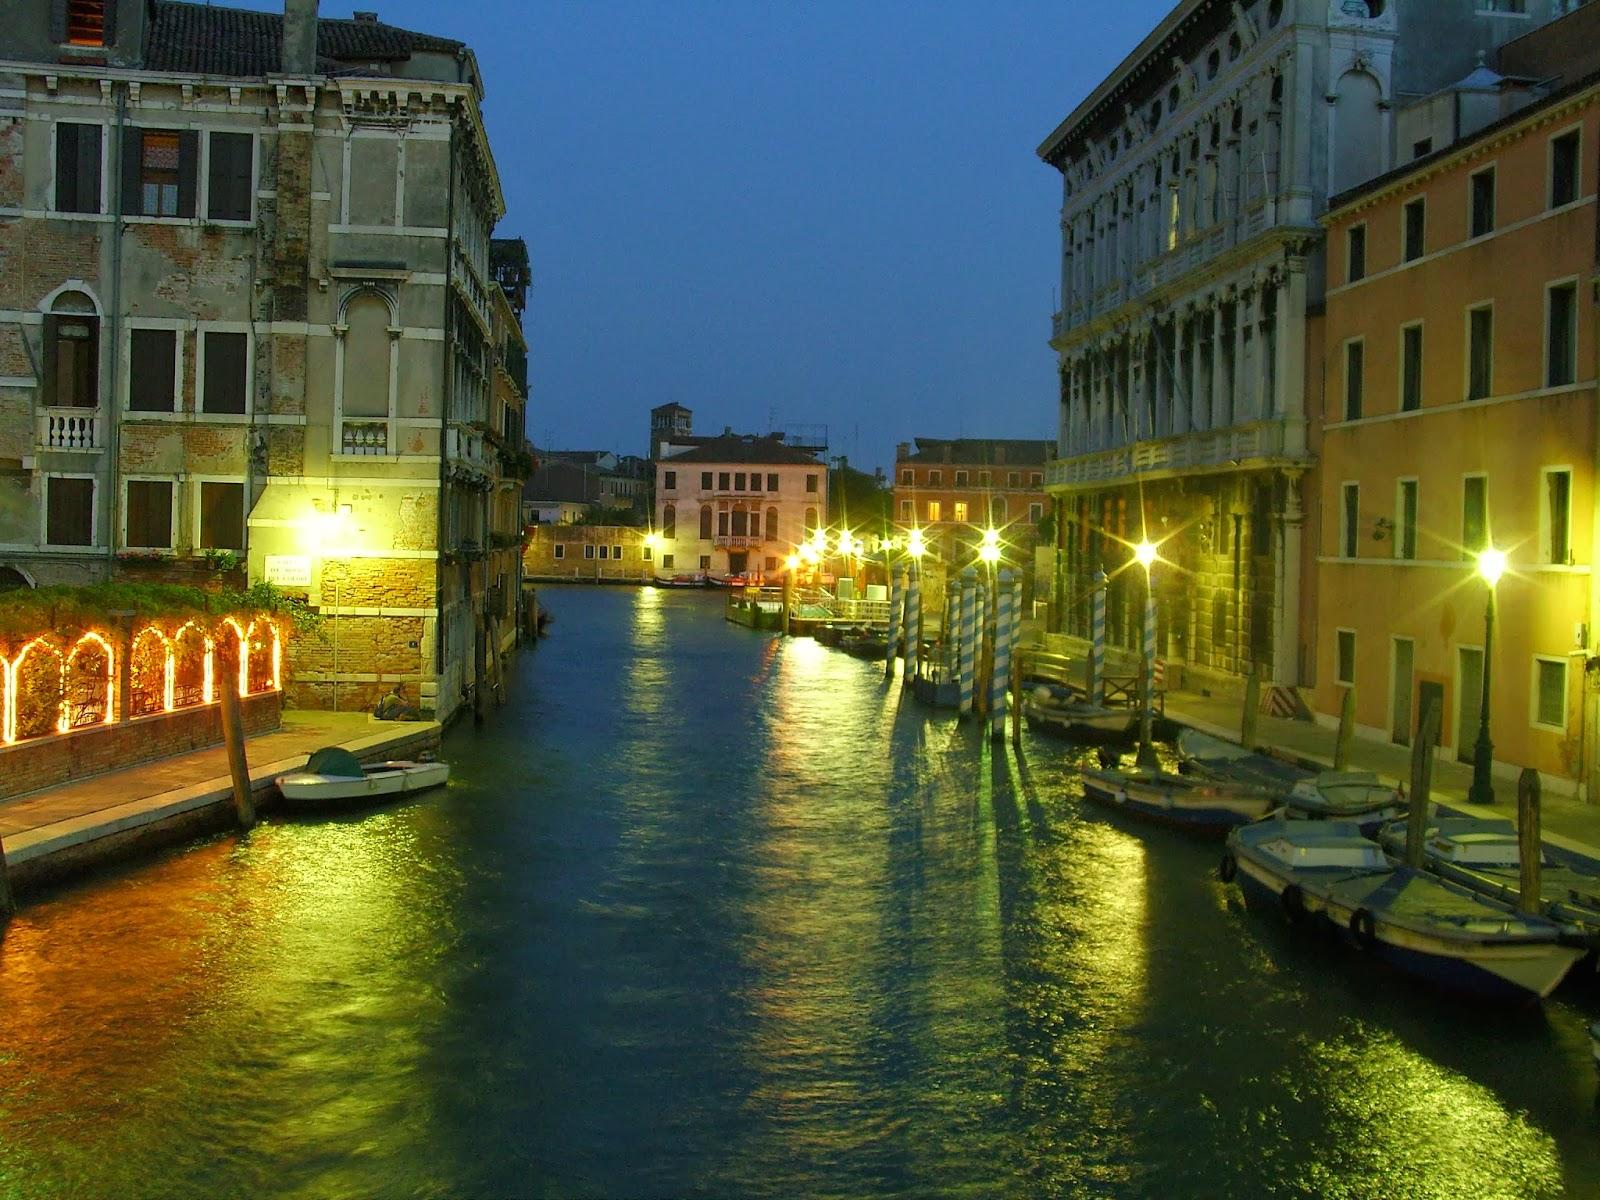 Aquapol blog aquapol salviamo venezia - Risalita capillare ...